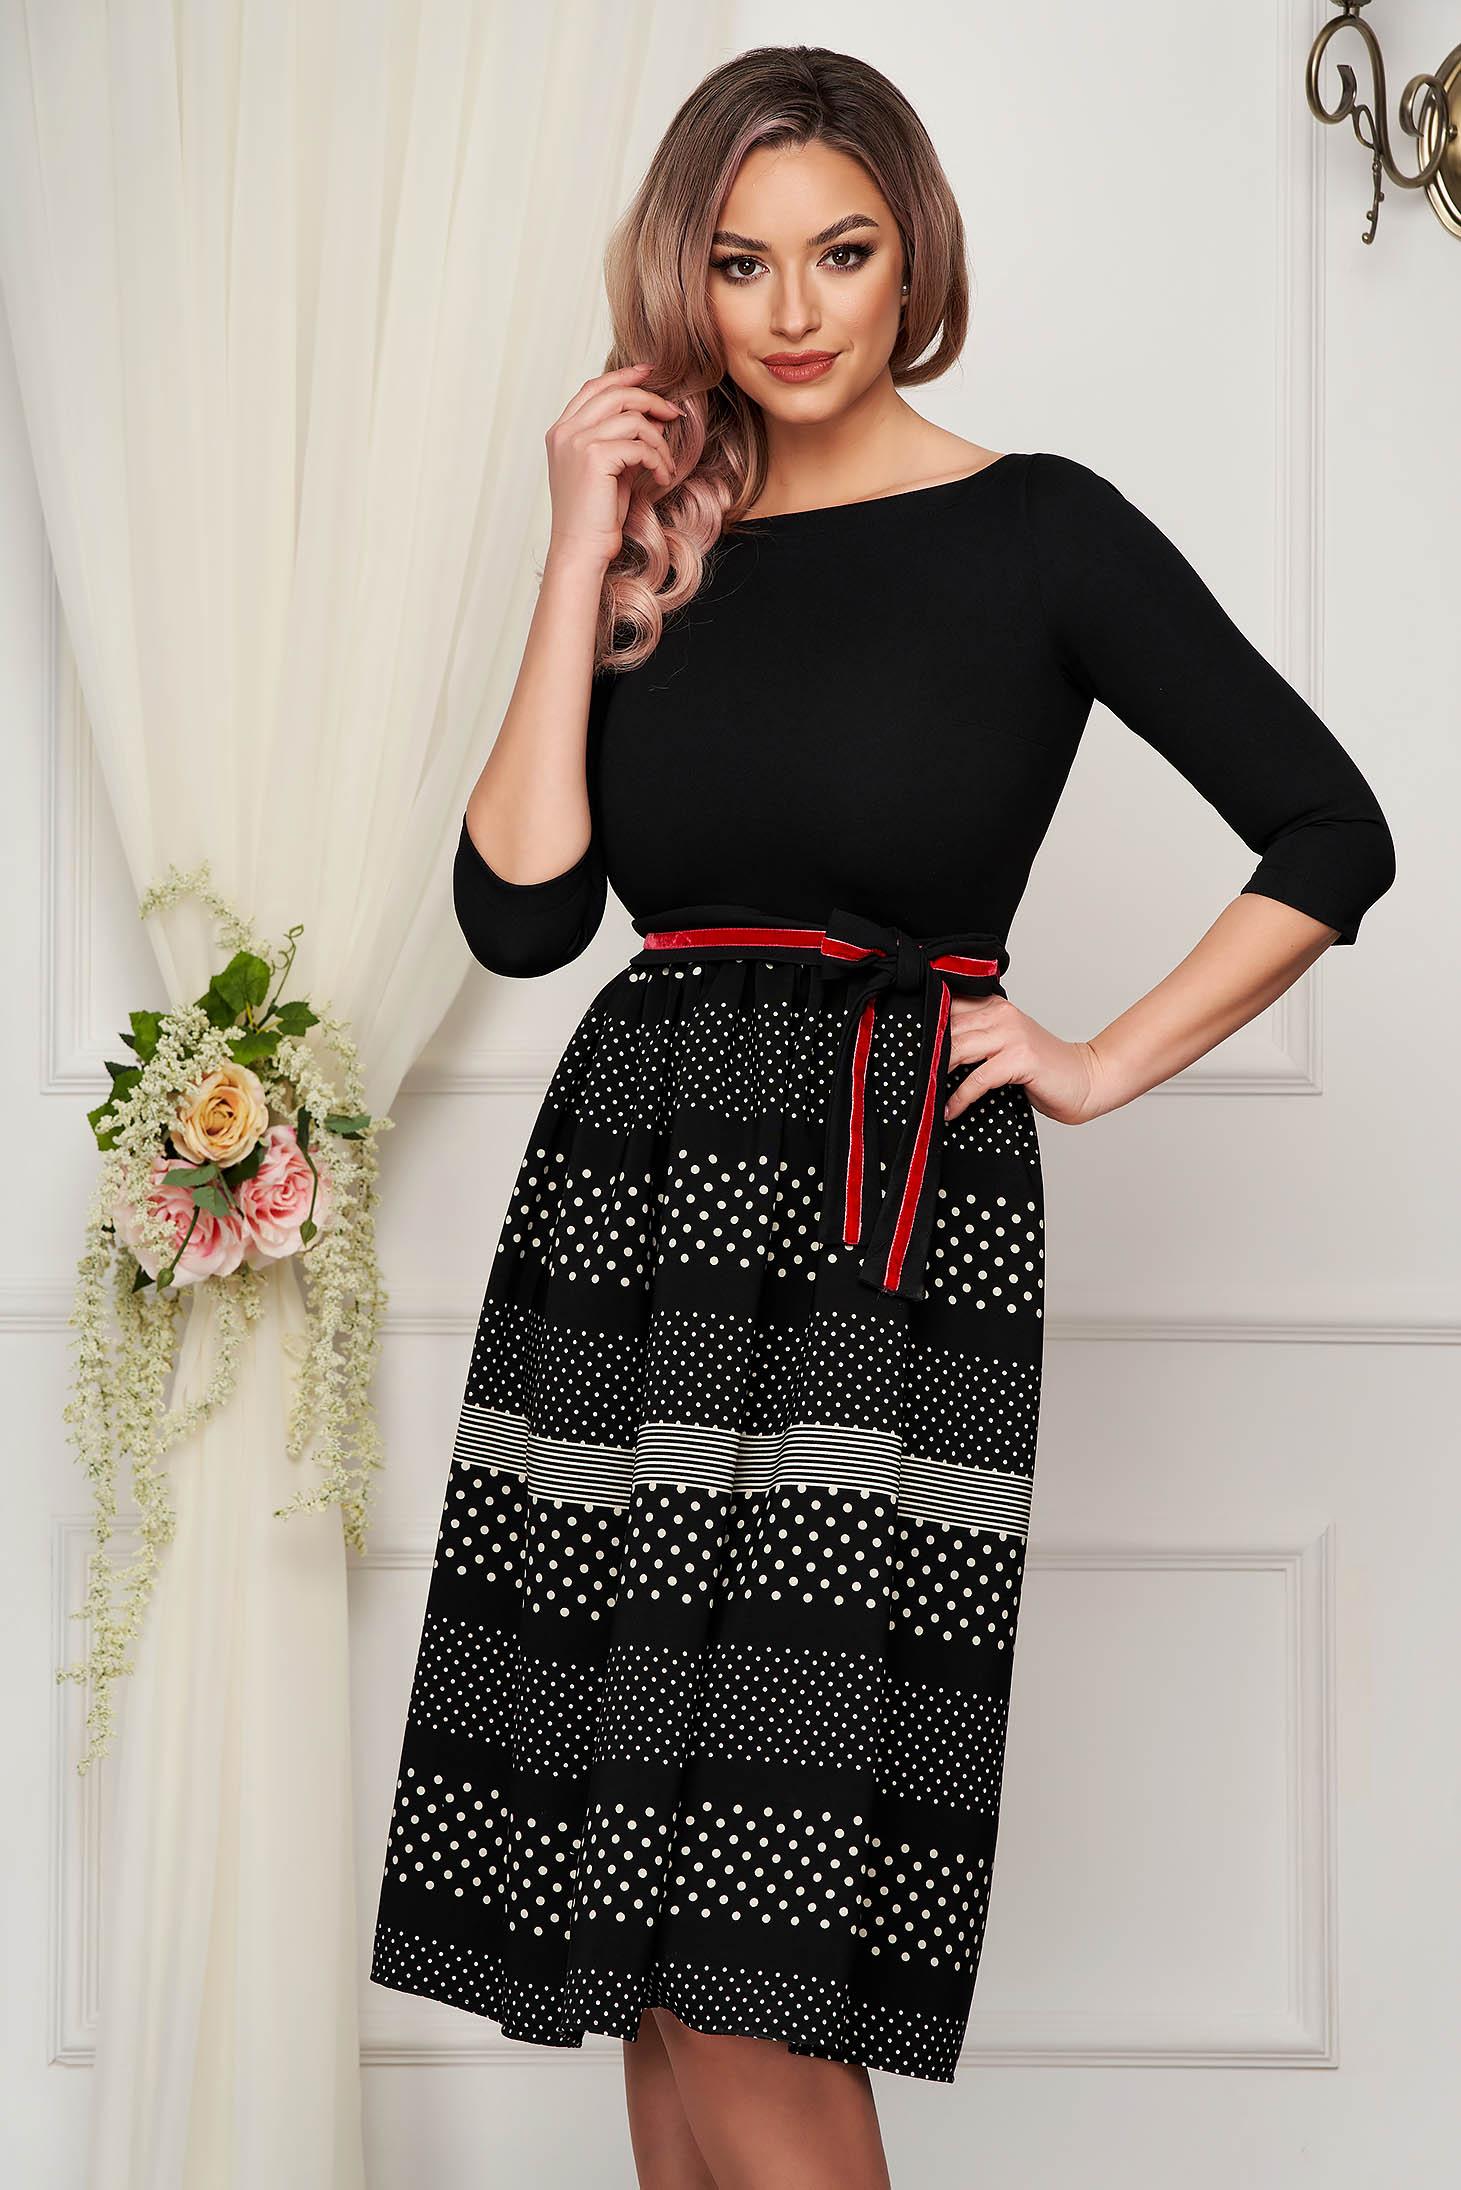 Dress StarShinerS black elegant midi cloche with 3/4 sleeves